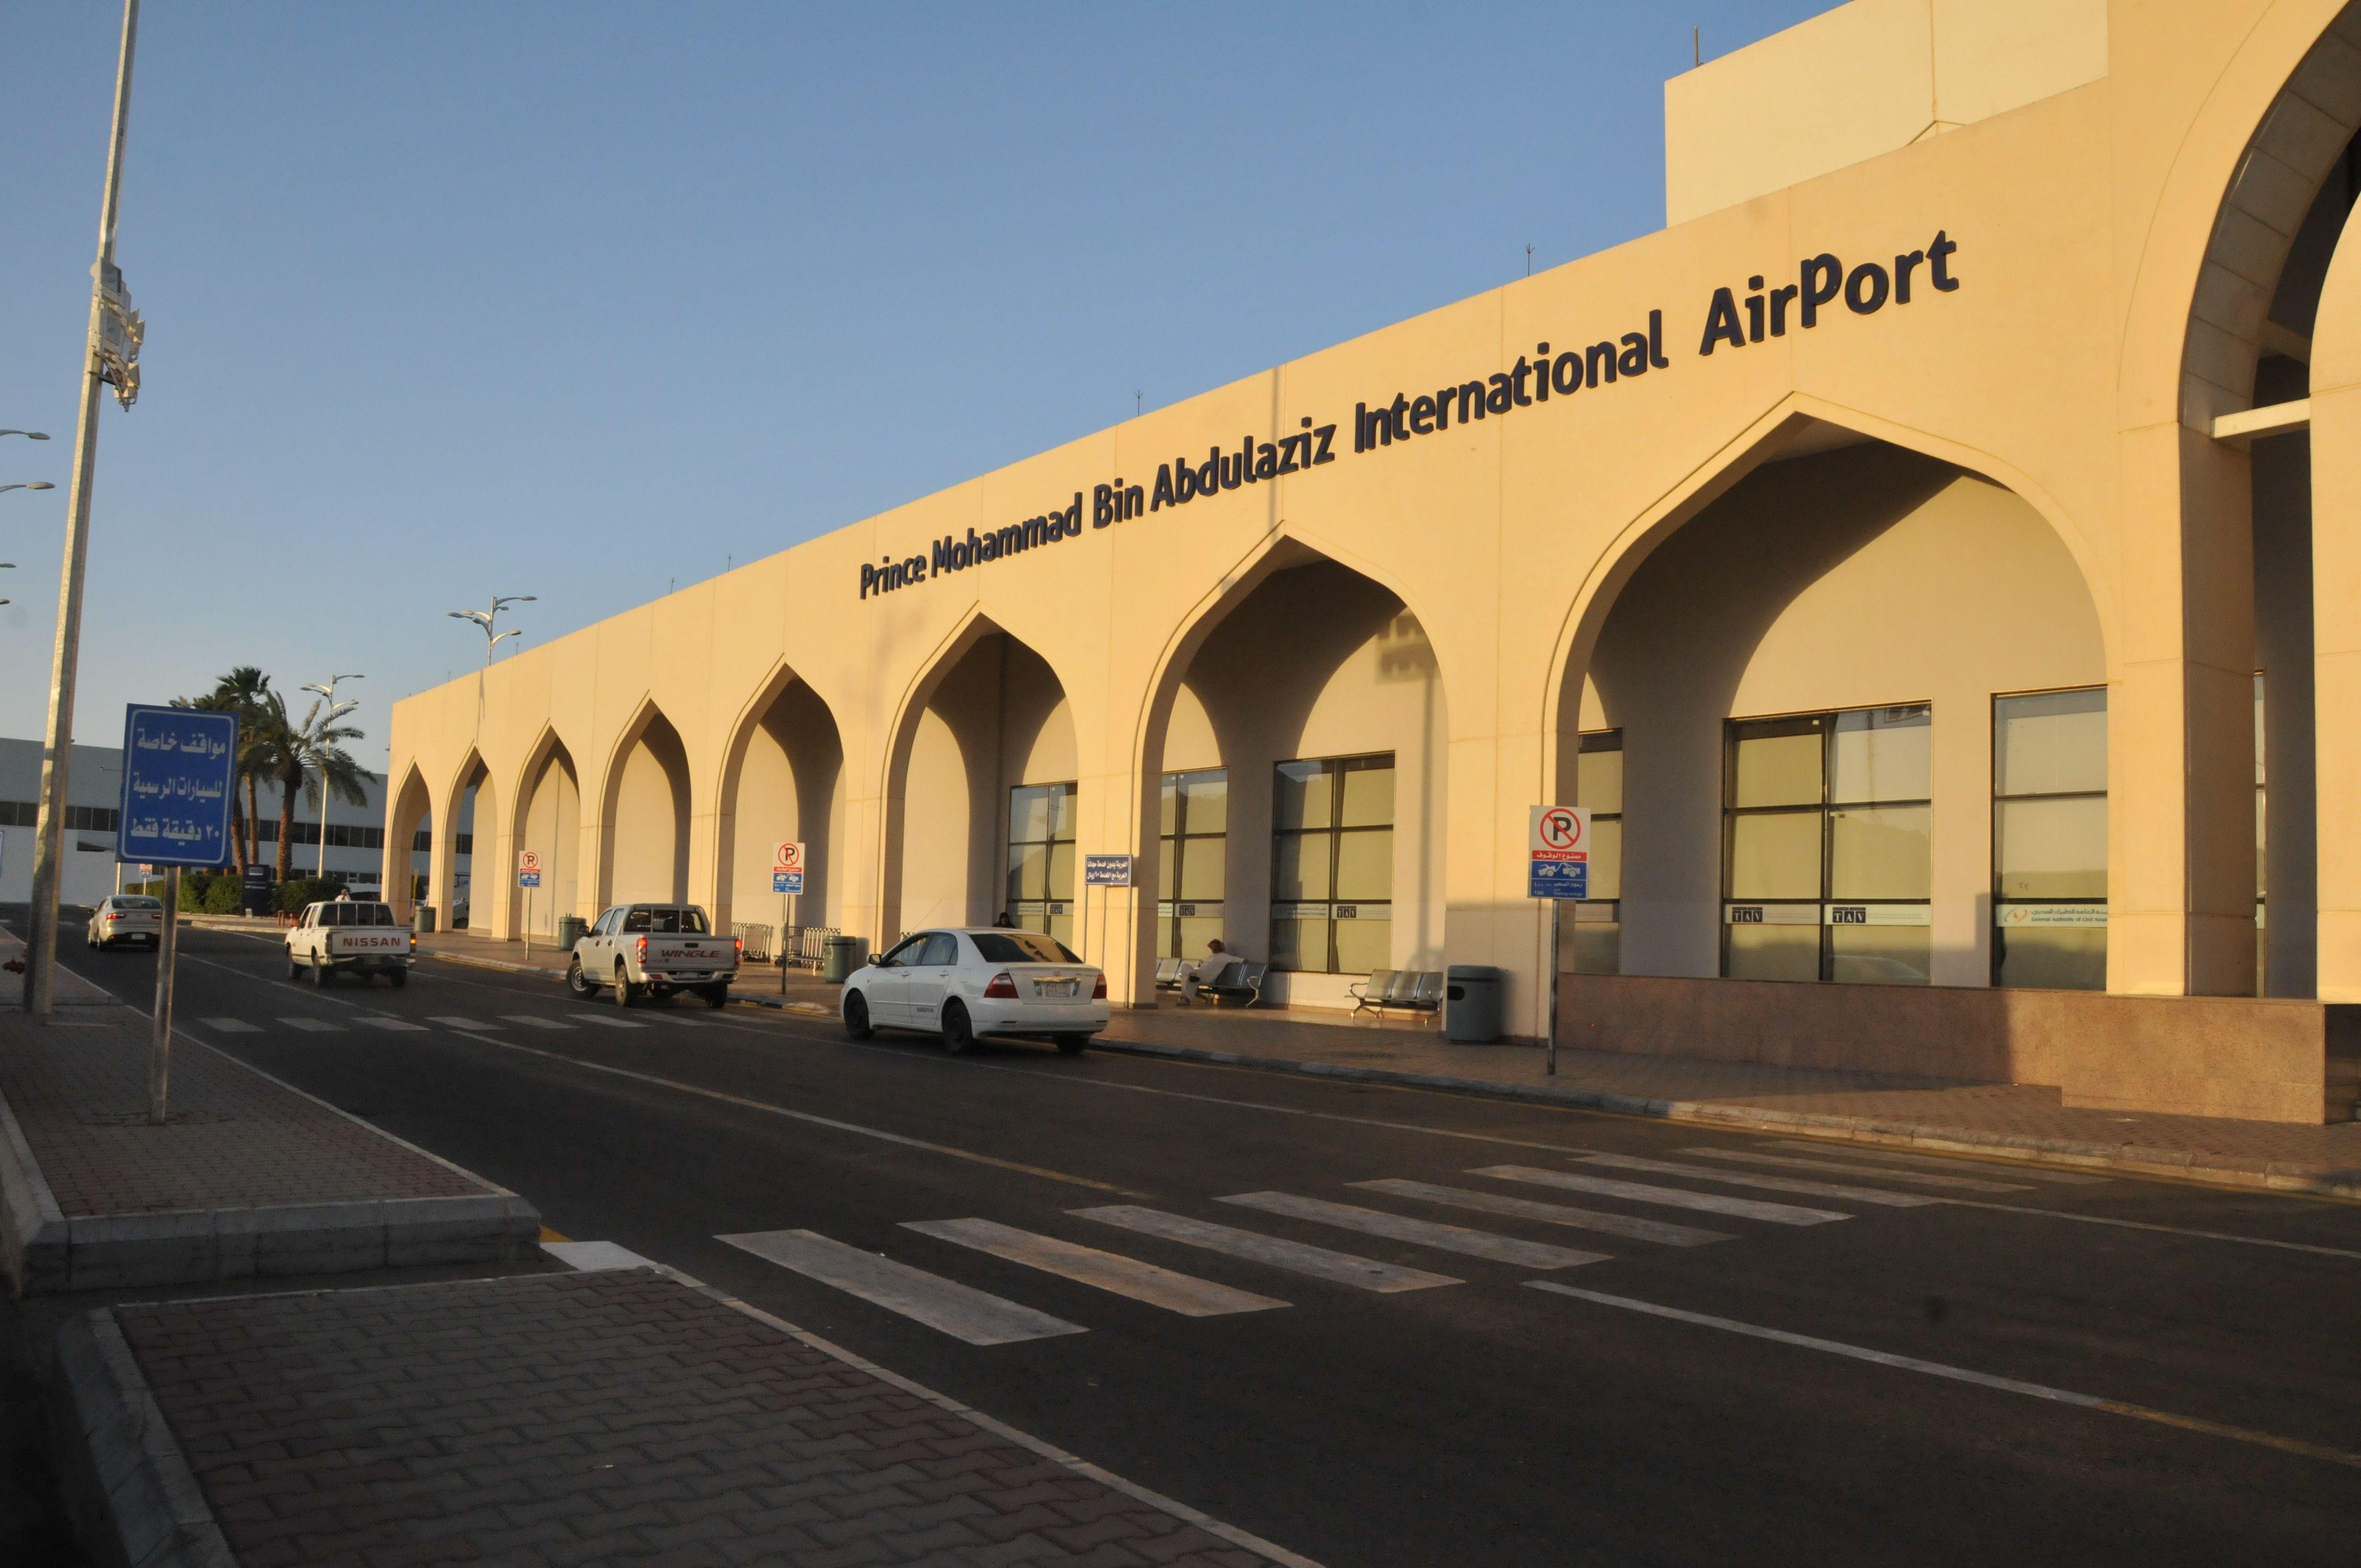 Prince Mohammad Bin Abdulaziz Airport Madinah Airport International Airport Civil Aviation Airport Signs